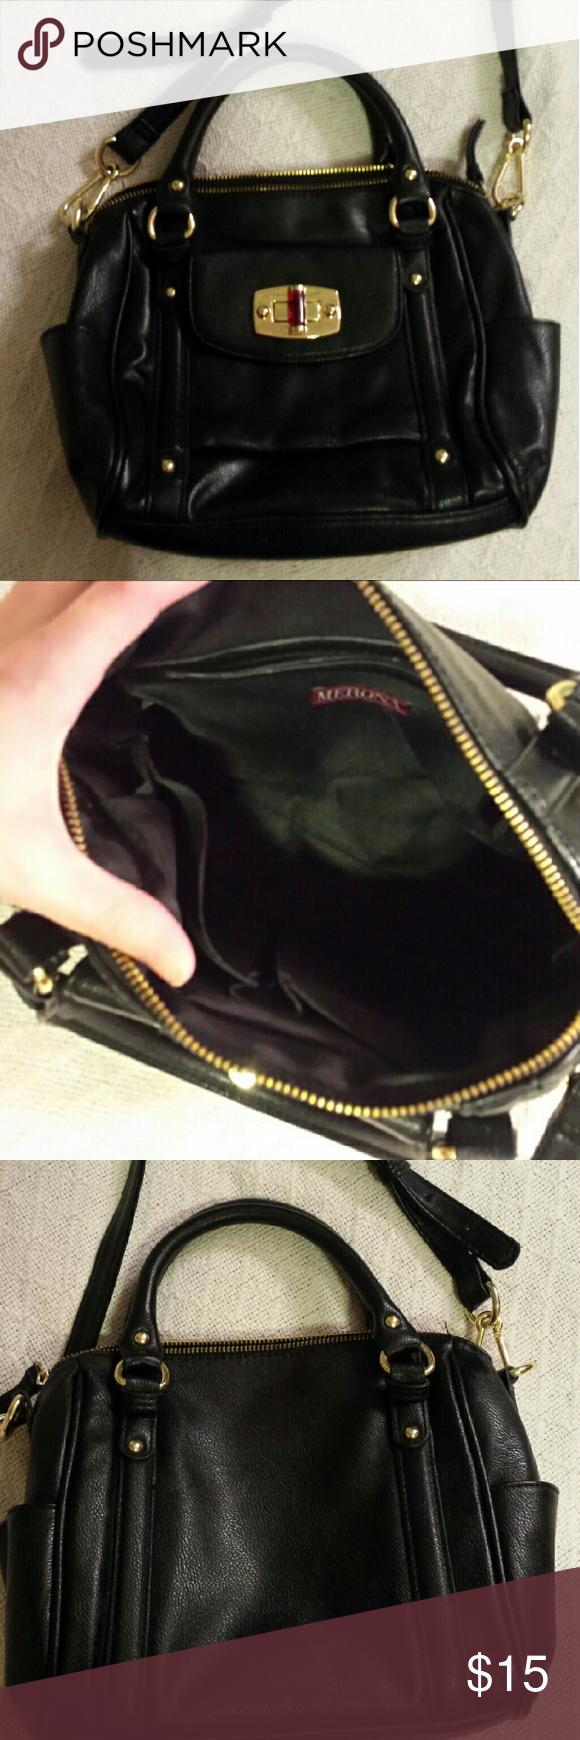 d25fa43334 Black and Gold Merona Satchel Crossbody purse Merona brand satchel purse  with detachable strap to be used as a crossbody bag. Gold hardware.